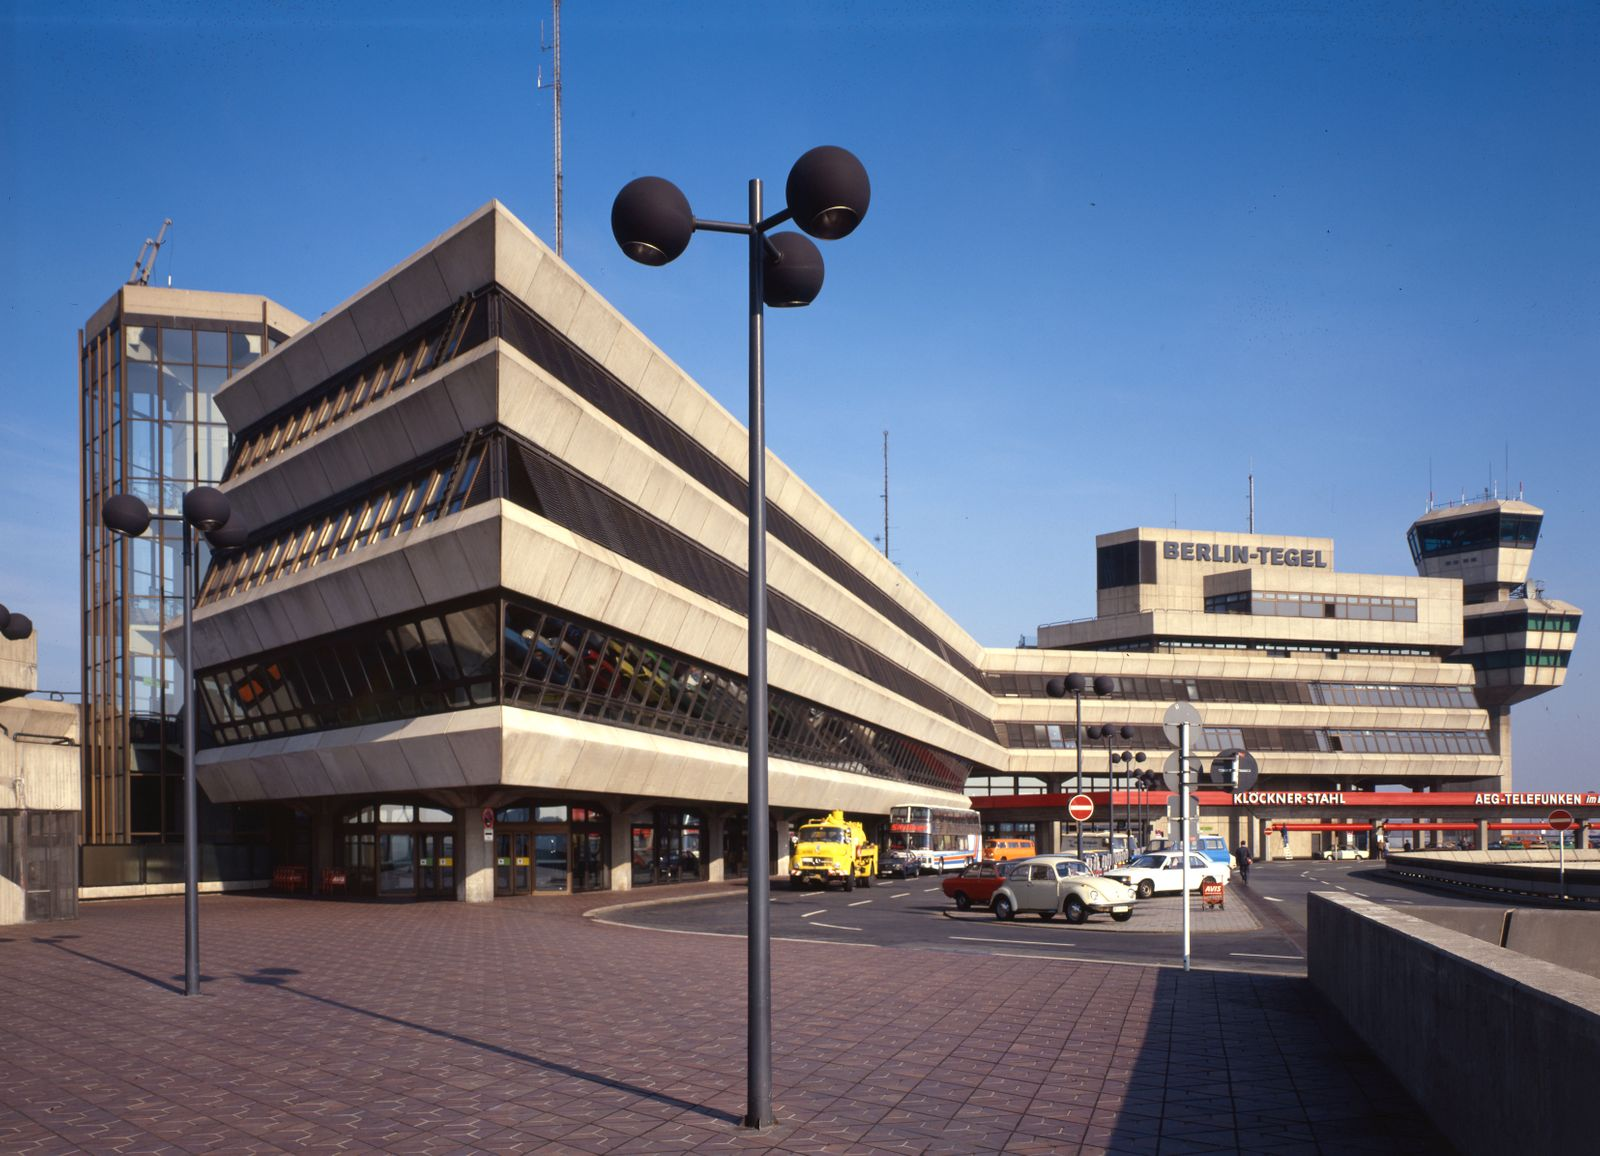 BUCH TXL. Berlin Tegel Airport / Drive to Your Gate / Seite 30-31, Bild 19